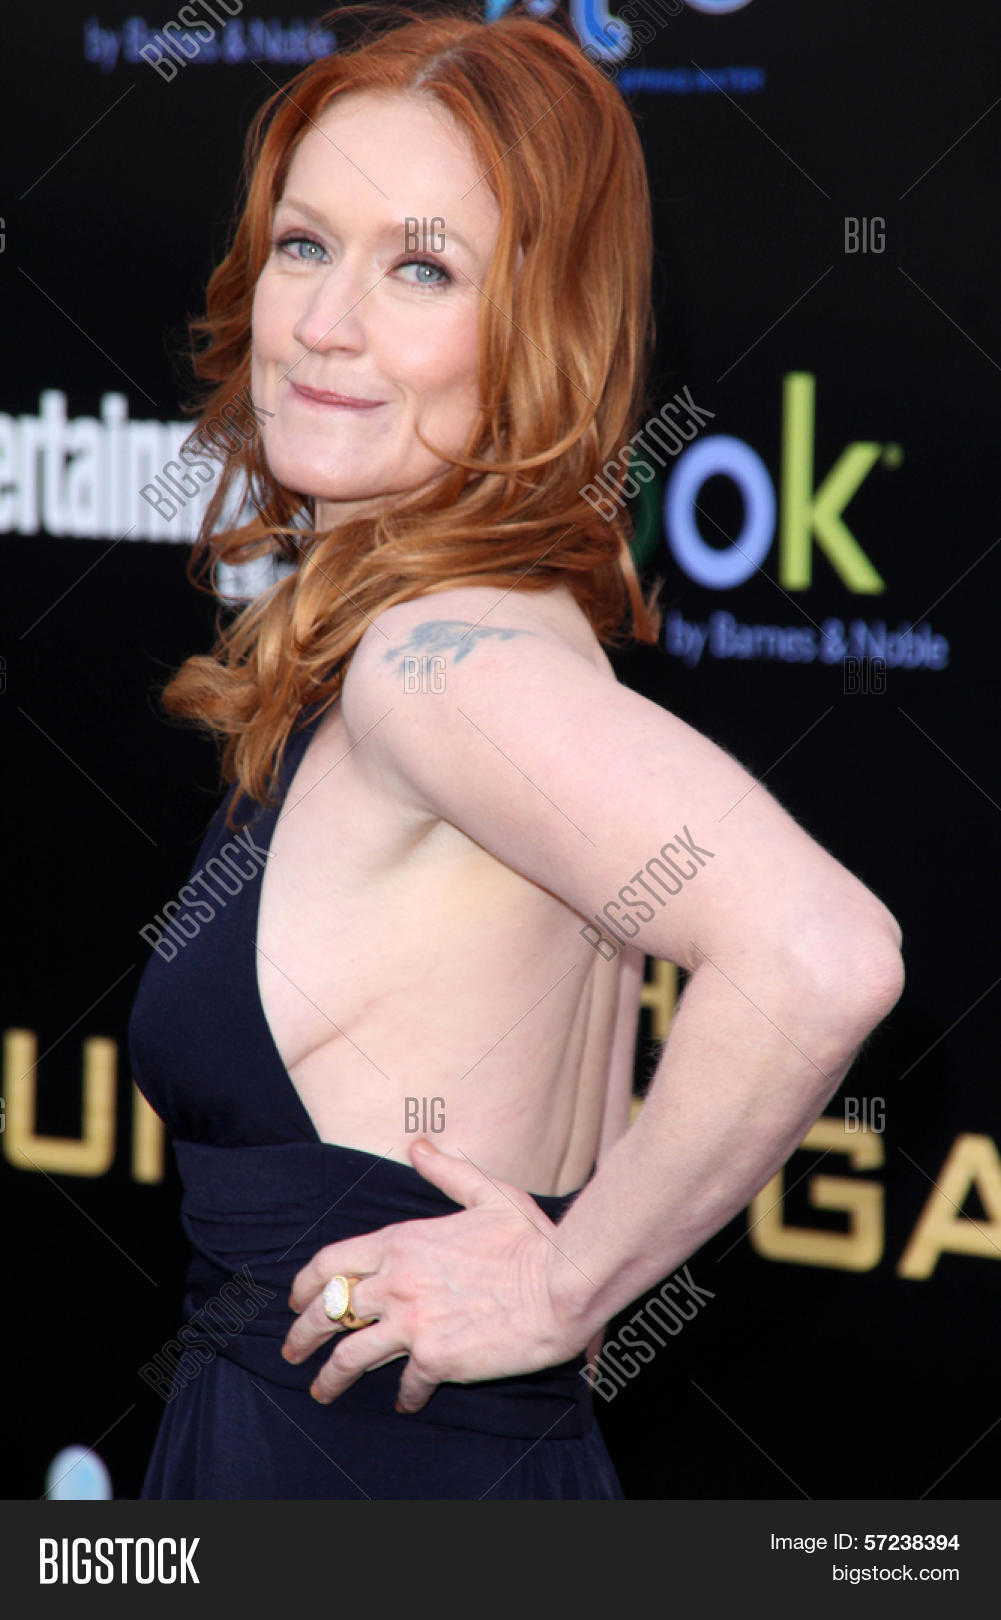 Paula Malcomson nude (98 photo), Ass, Paparazzi, Twitter, butt 2015